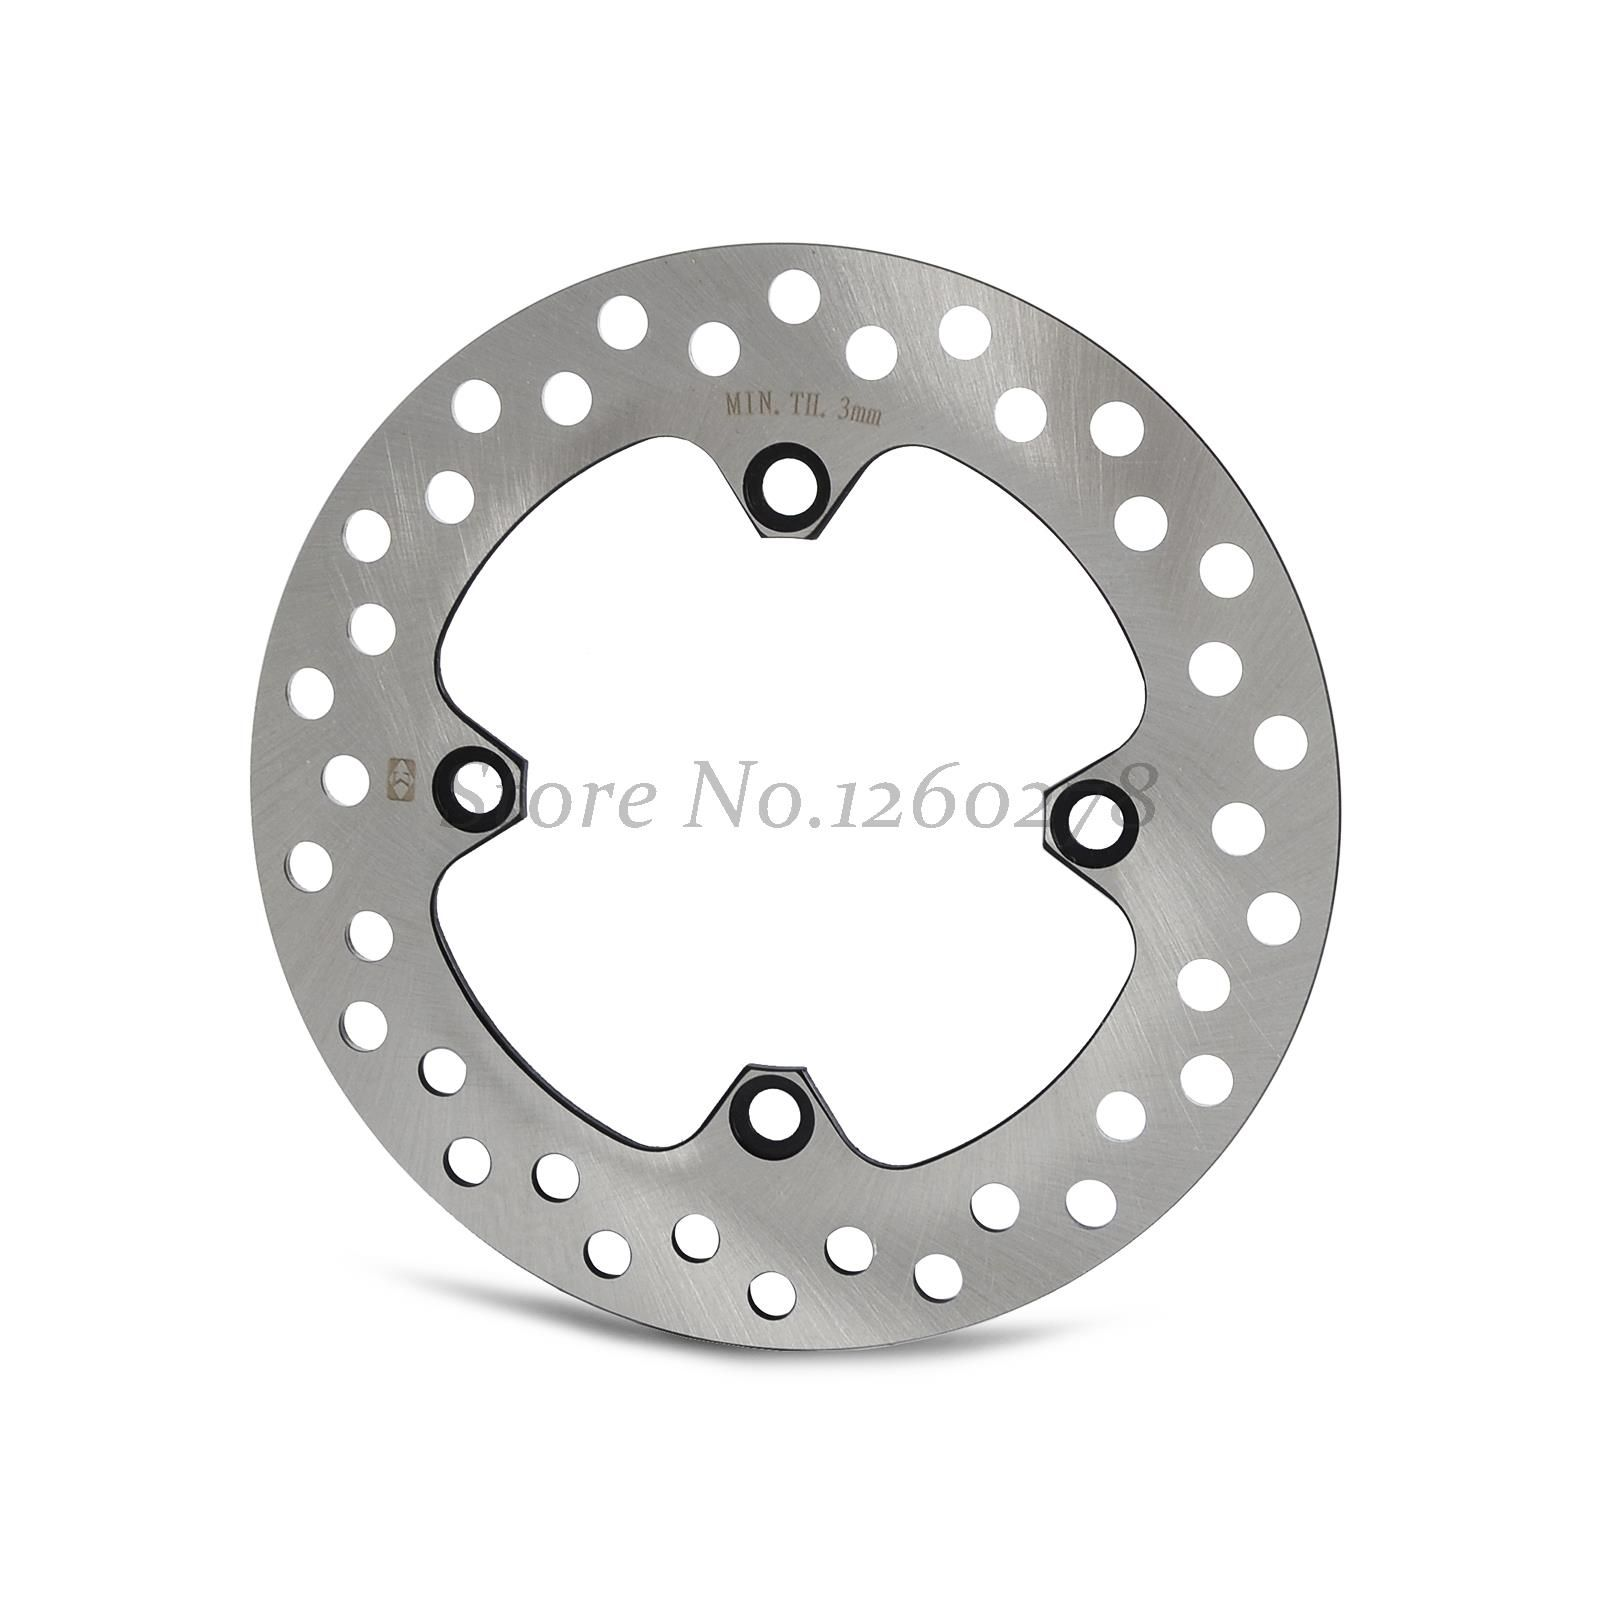 New Motorcycle Rear Rotor Brake Disc For Kawasaki KFX400 Suzuki LTZ400 LT-Z 400 Honda CBR125 XR 250 XR 400 600 TRX400EX